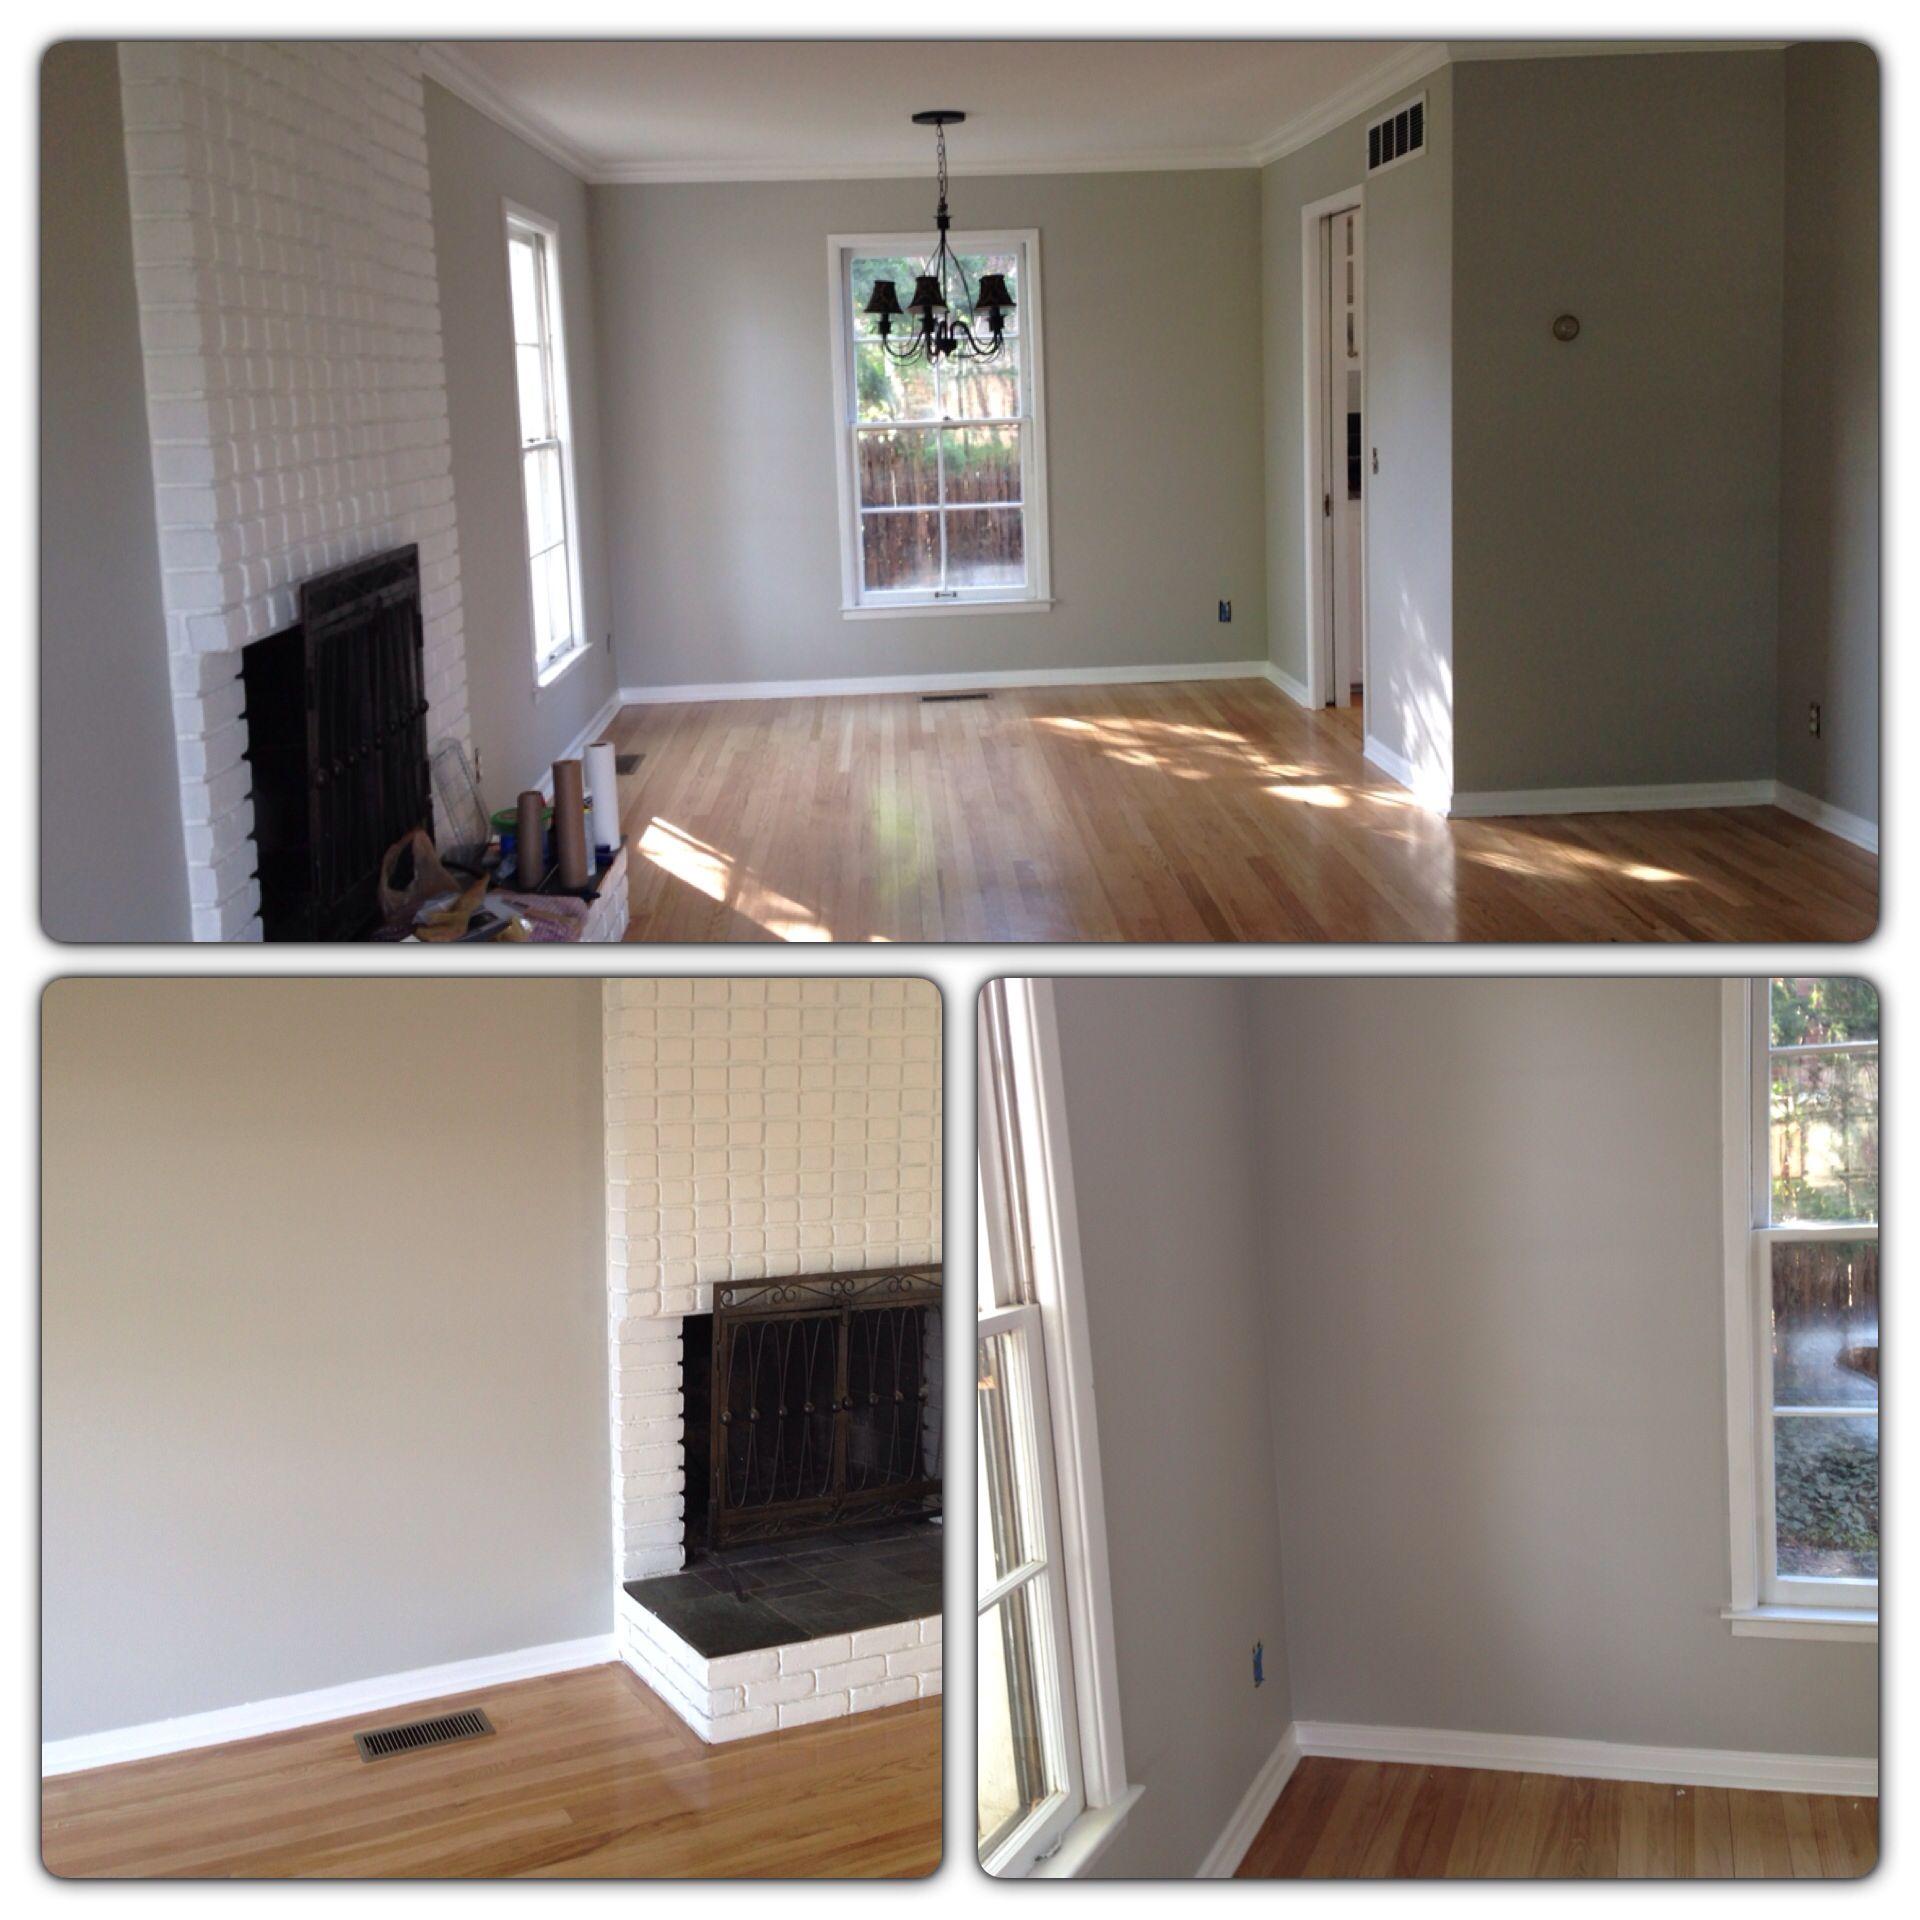 Light gray walls with light oak hardwood floors. Wall